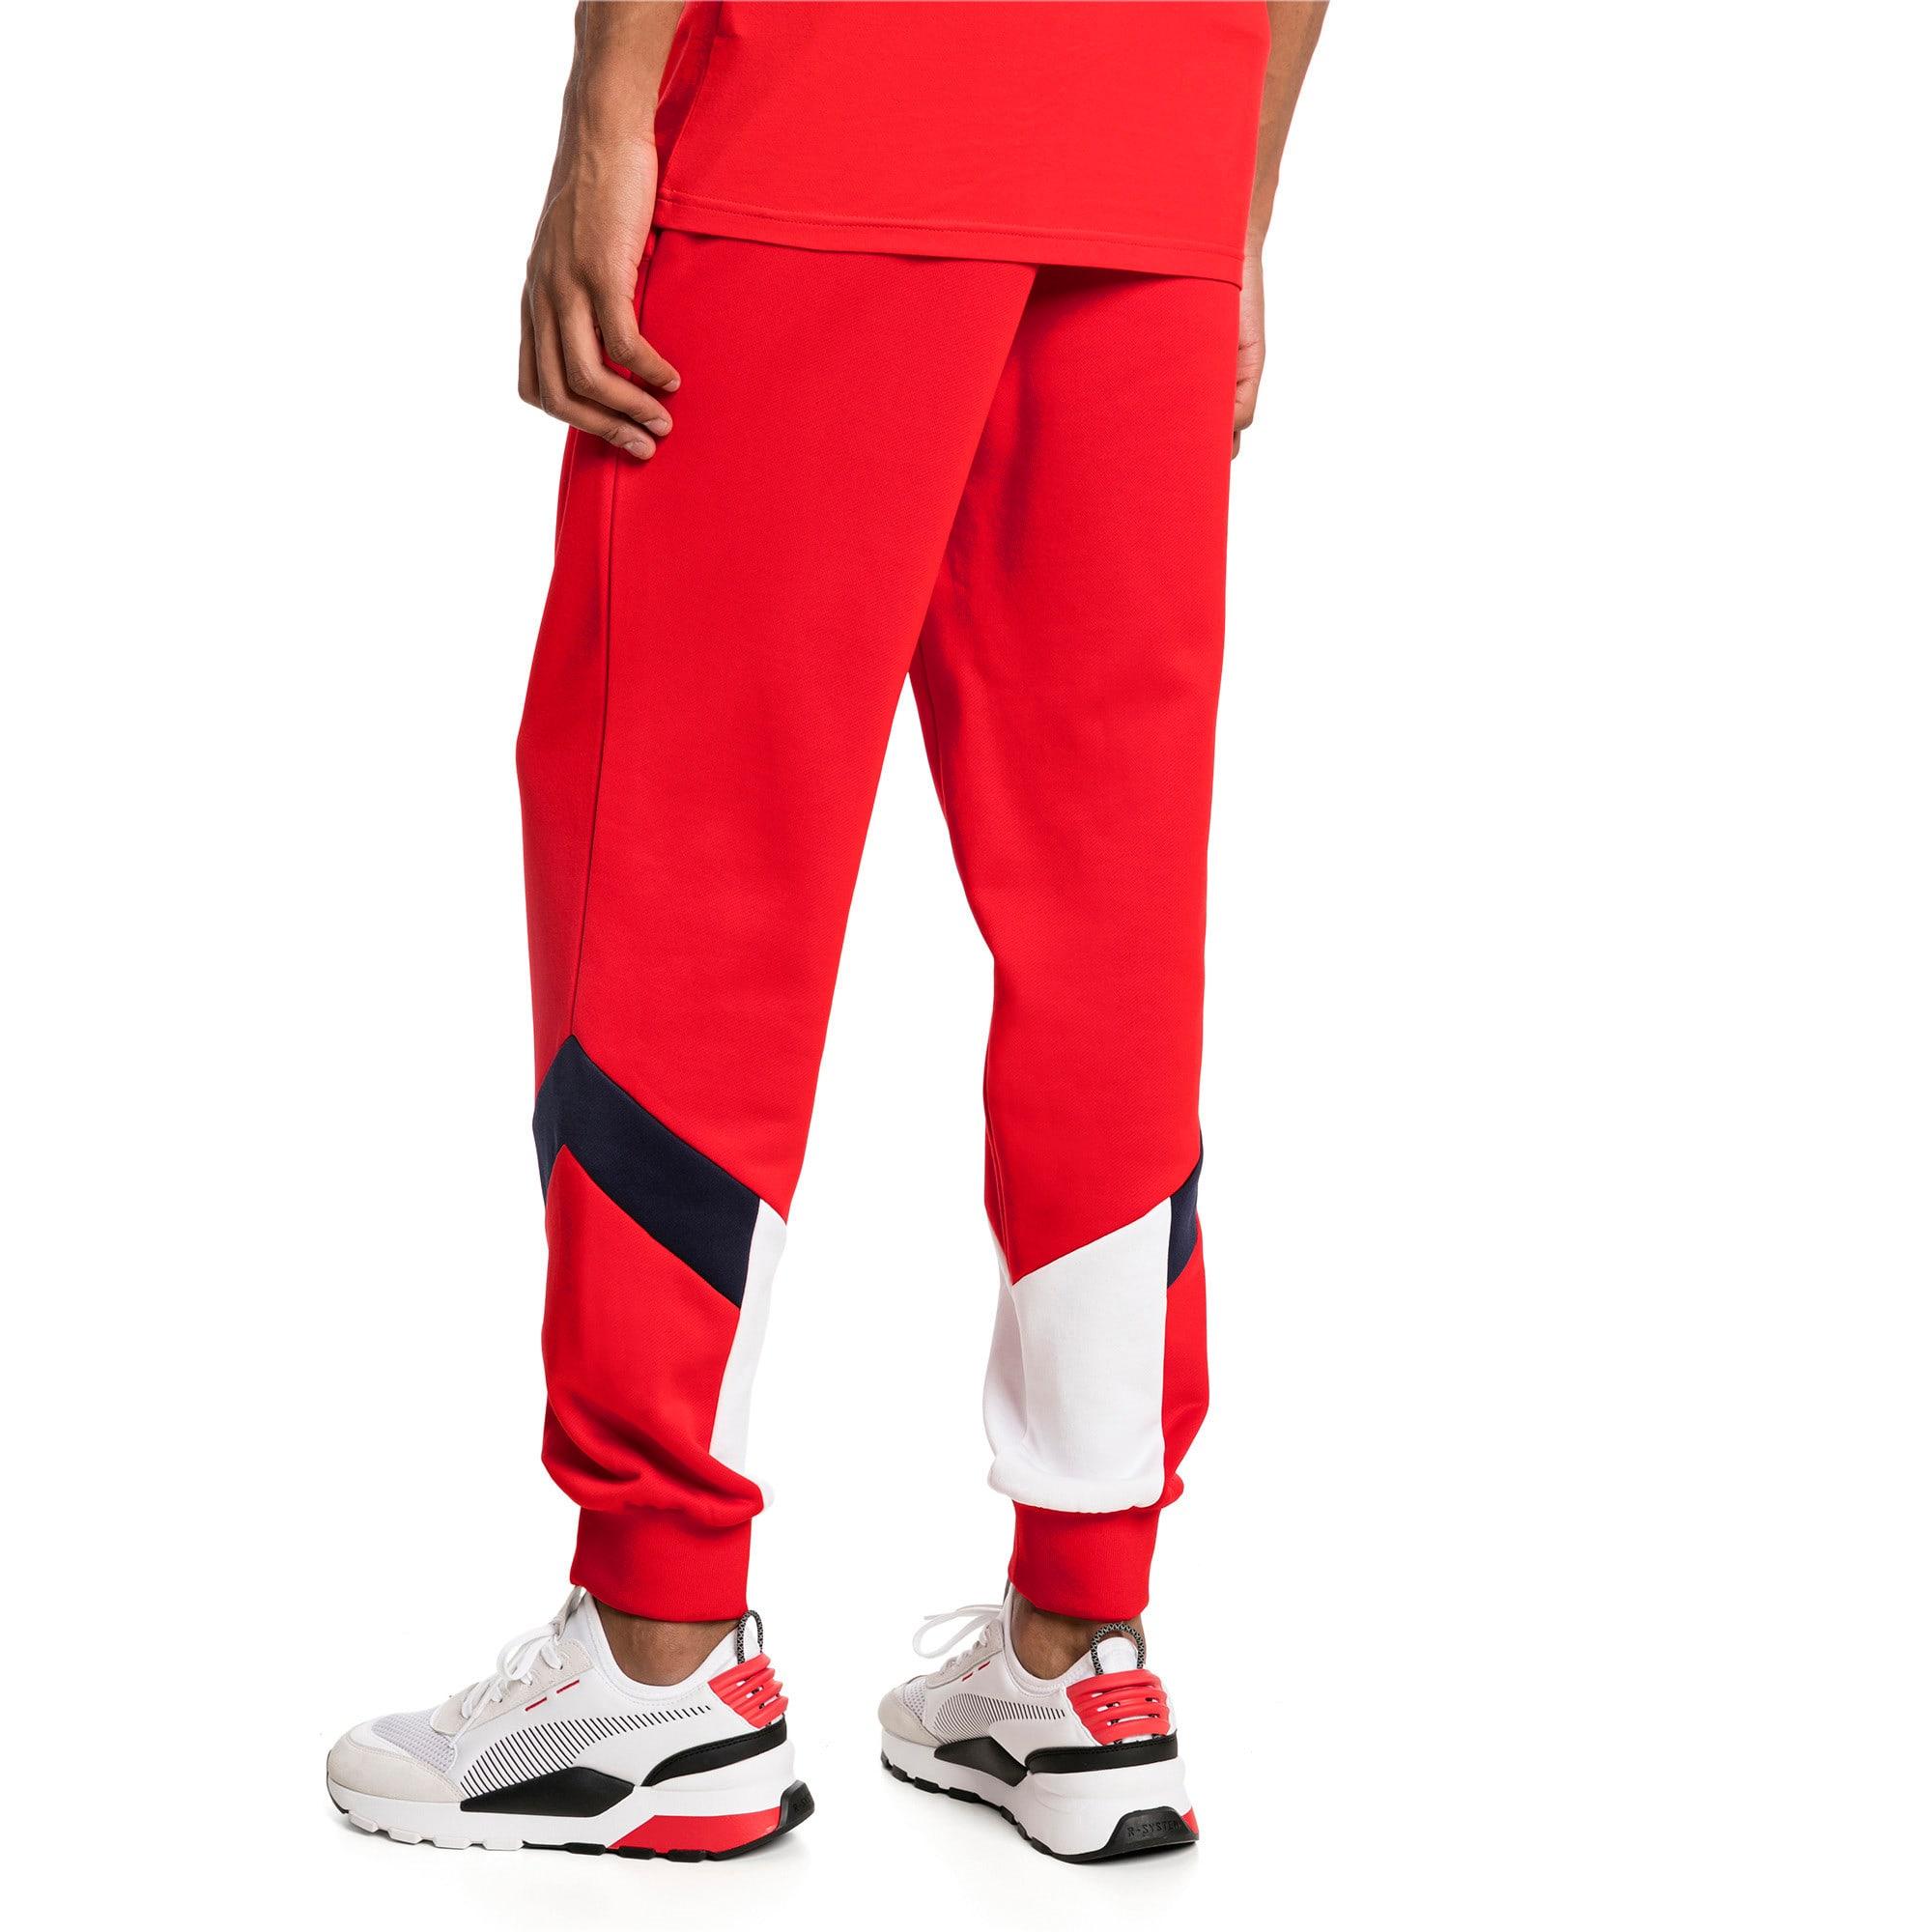 Thumbnail 3 of Iconic MCS Men's Track Pants, High Risk Red, medium